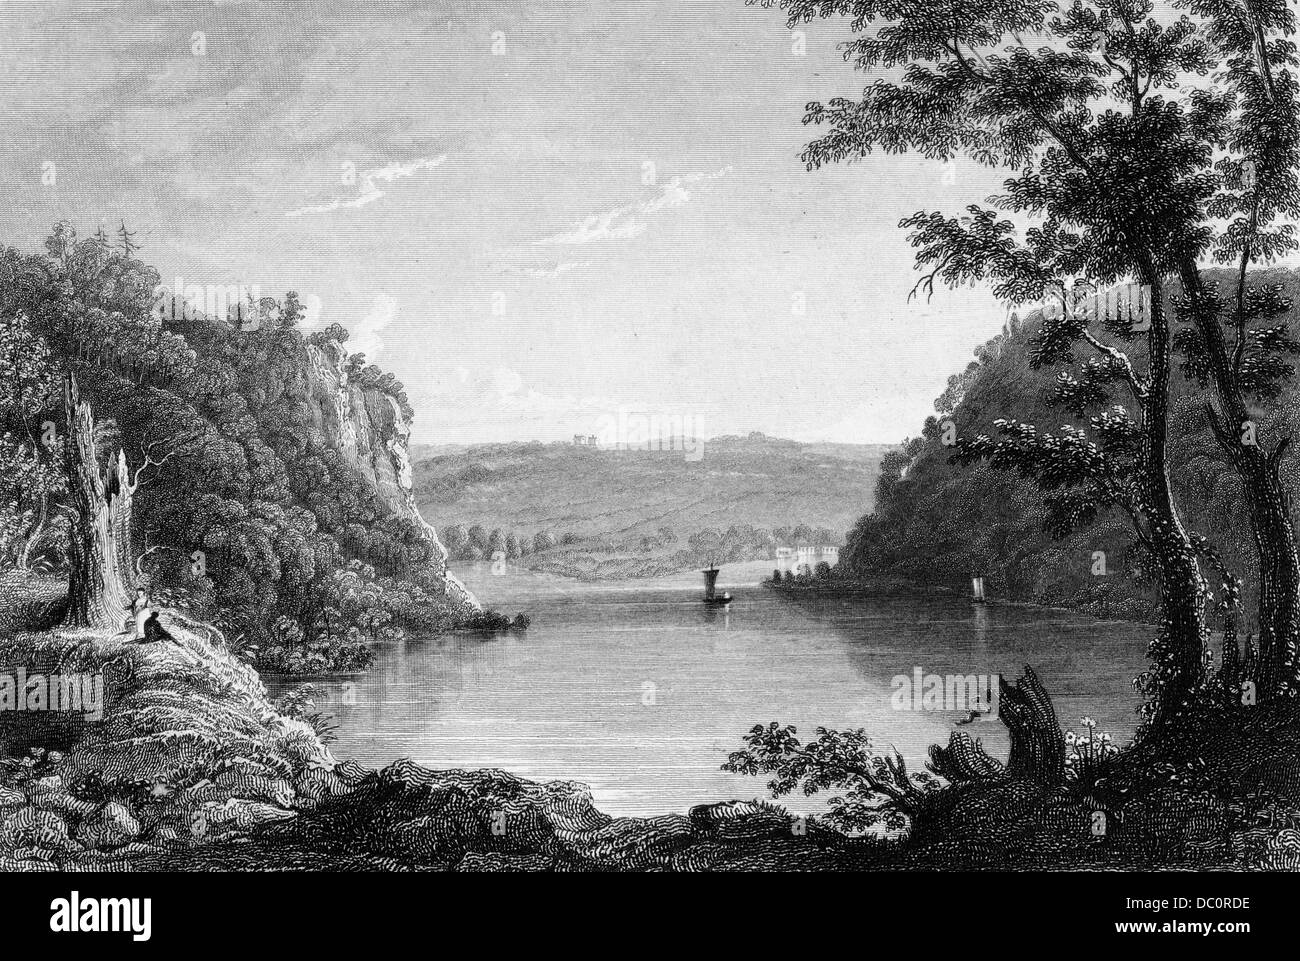 IDYLLISCHE SZENE VON HARPERS FERRY WEST VIRGINIA KREUZUNG DER SHENANDOAH & POTOMAC RIVERS Stockbild